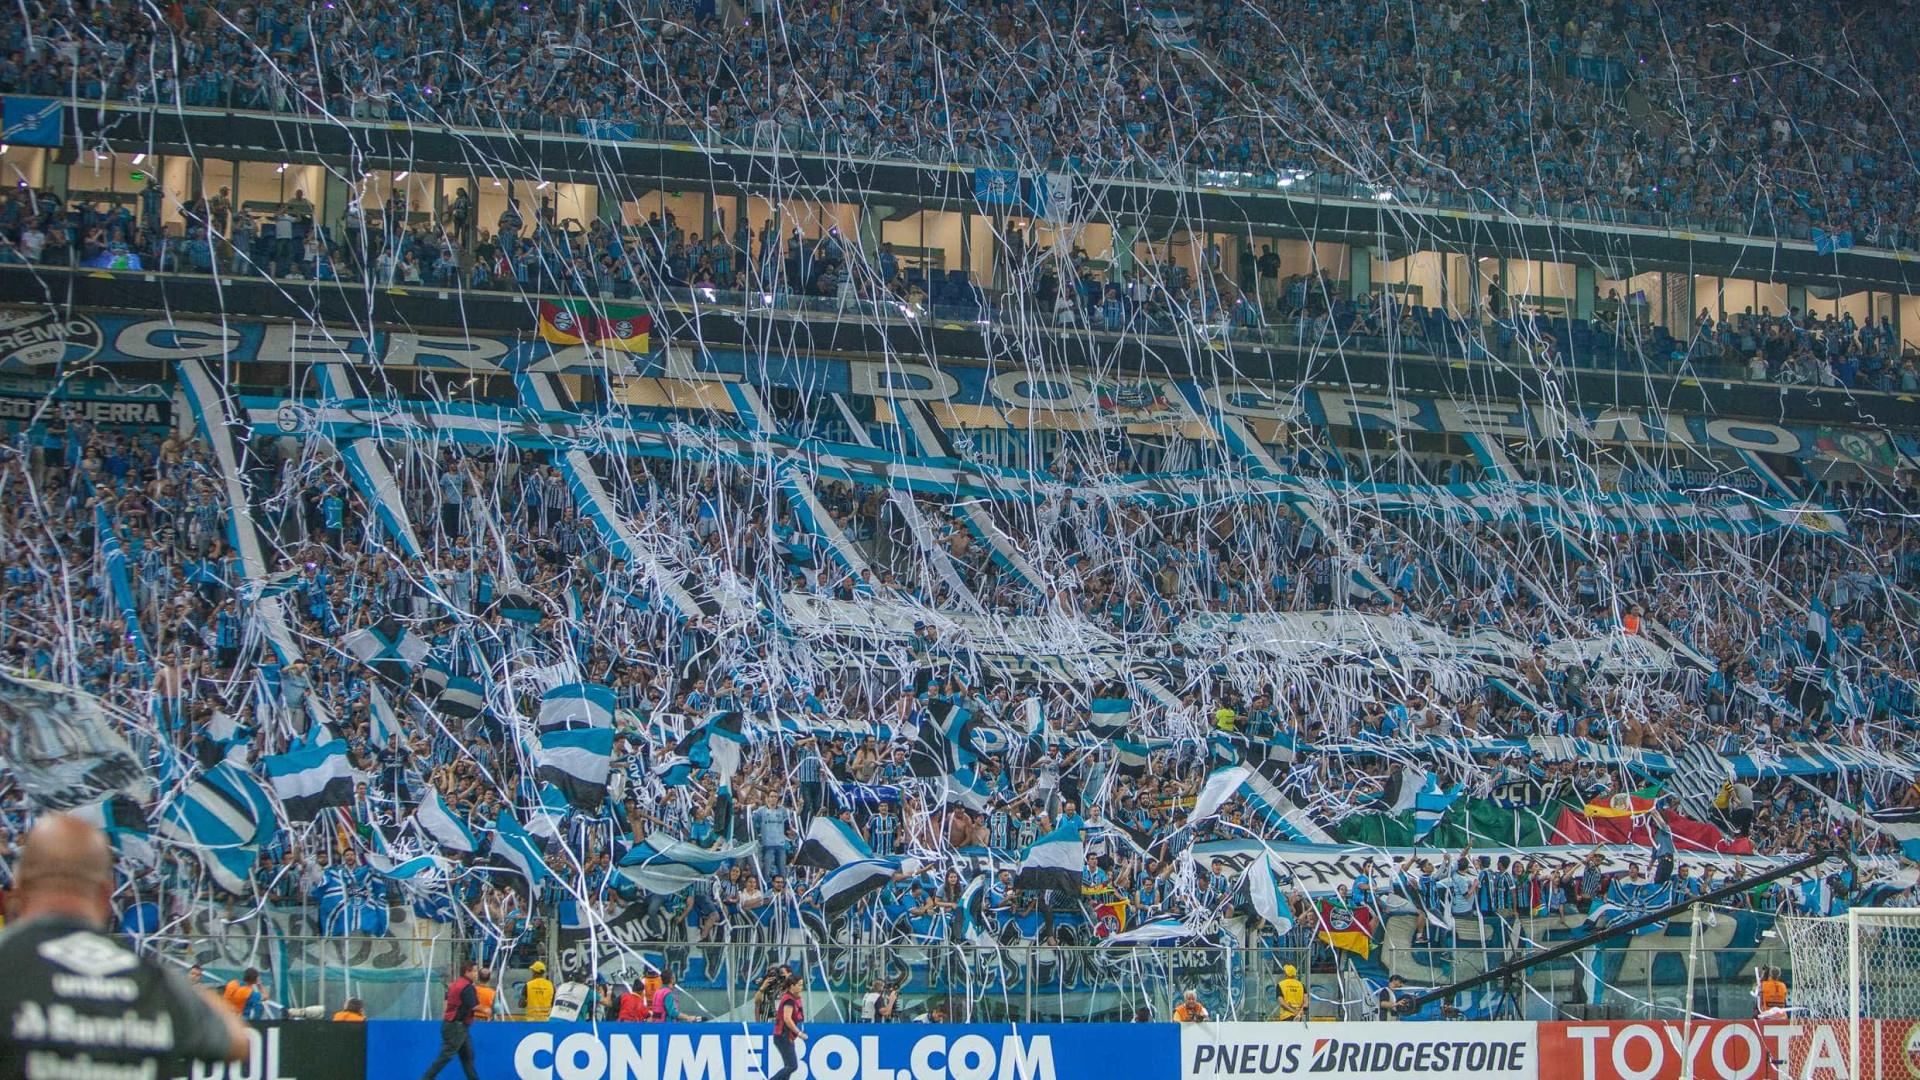 Torcedor é condenado por abuso sexual na Arena do Grêmio